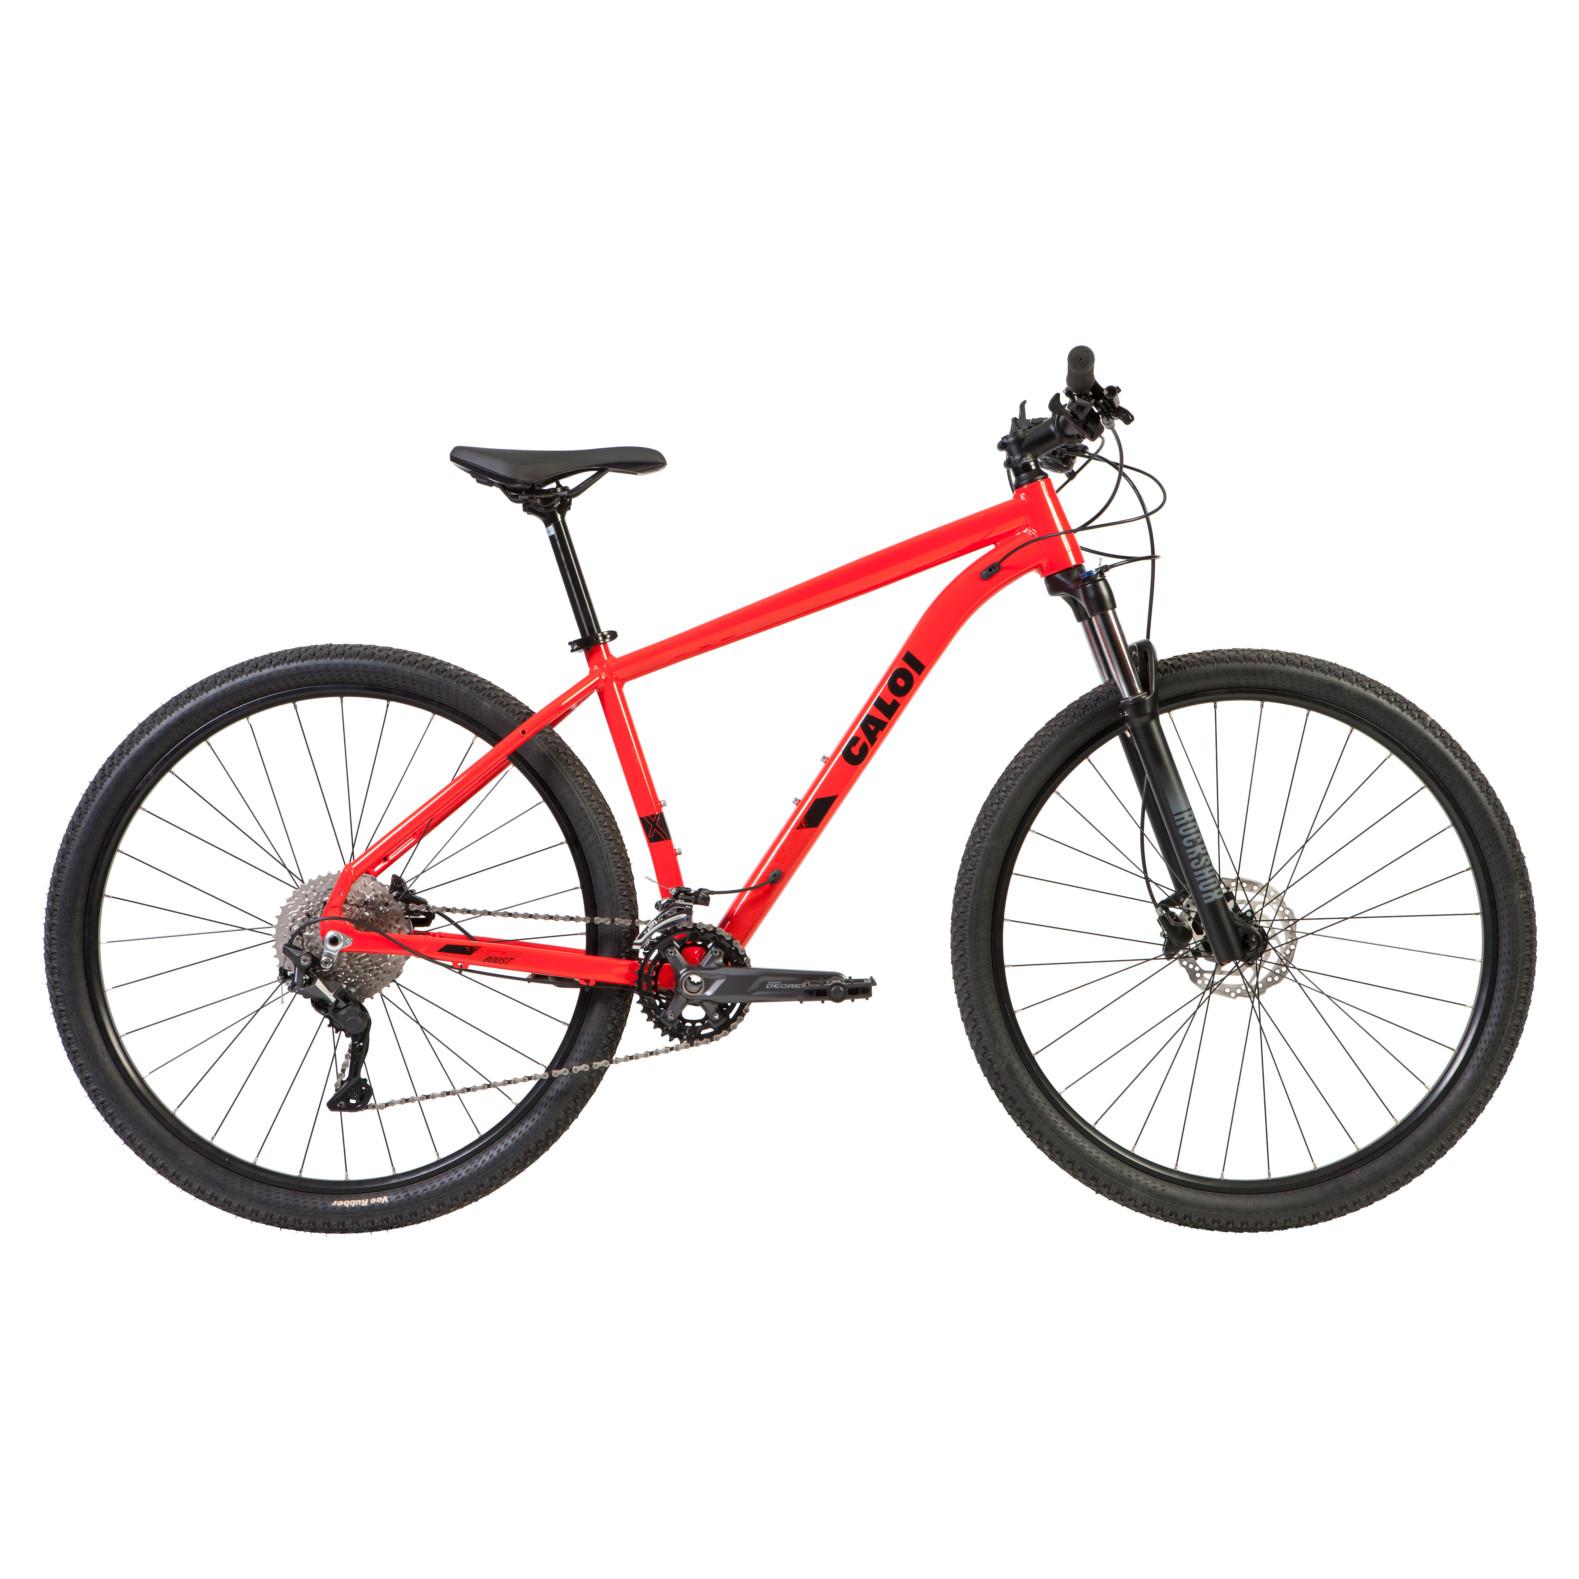 Bicicleta MTB Caloi Explorer Expert 20v 2021